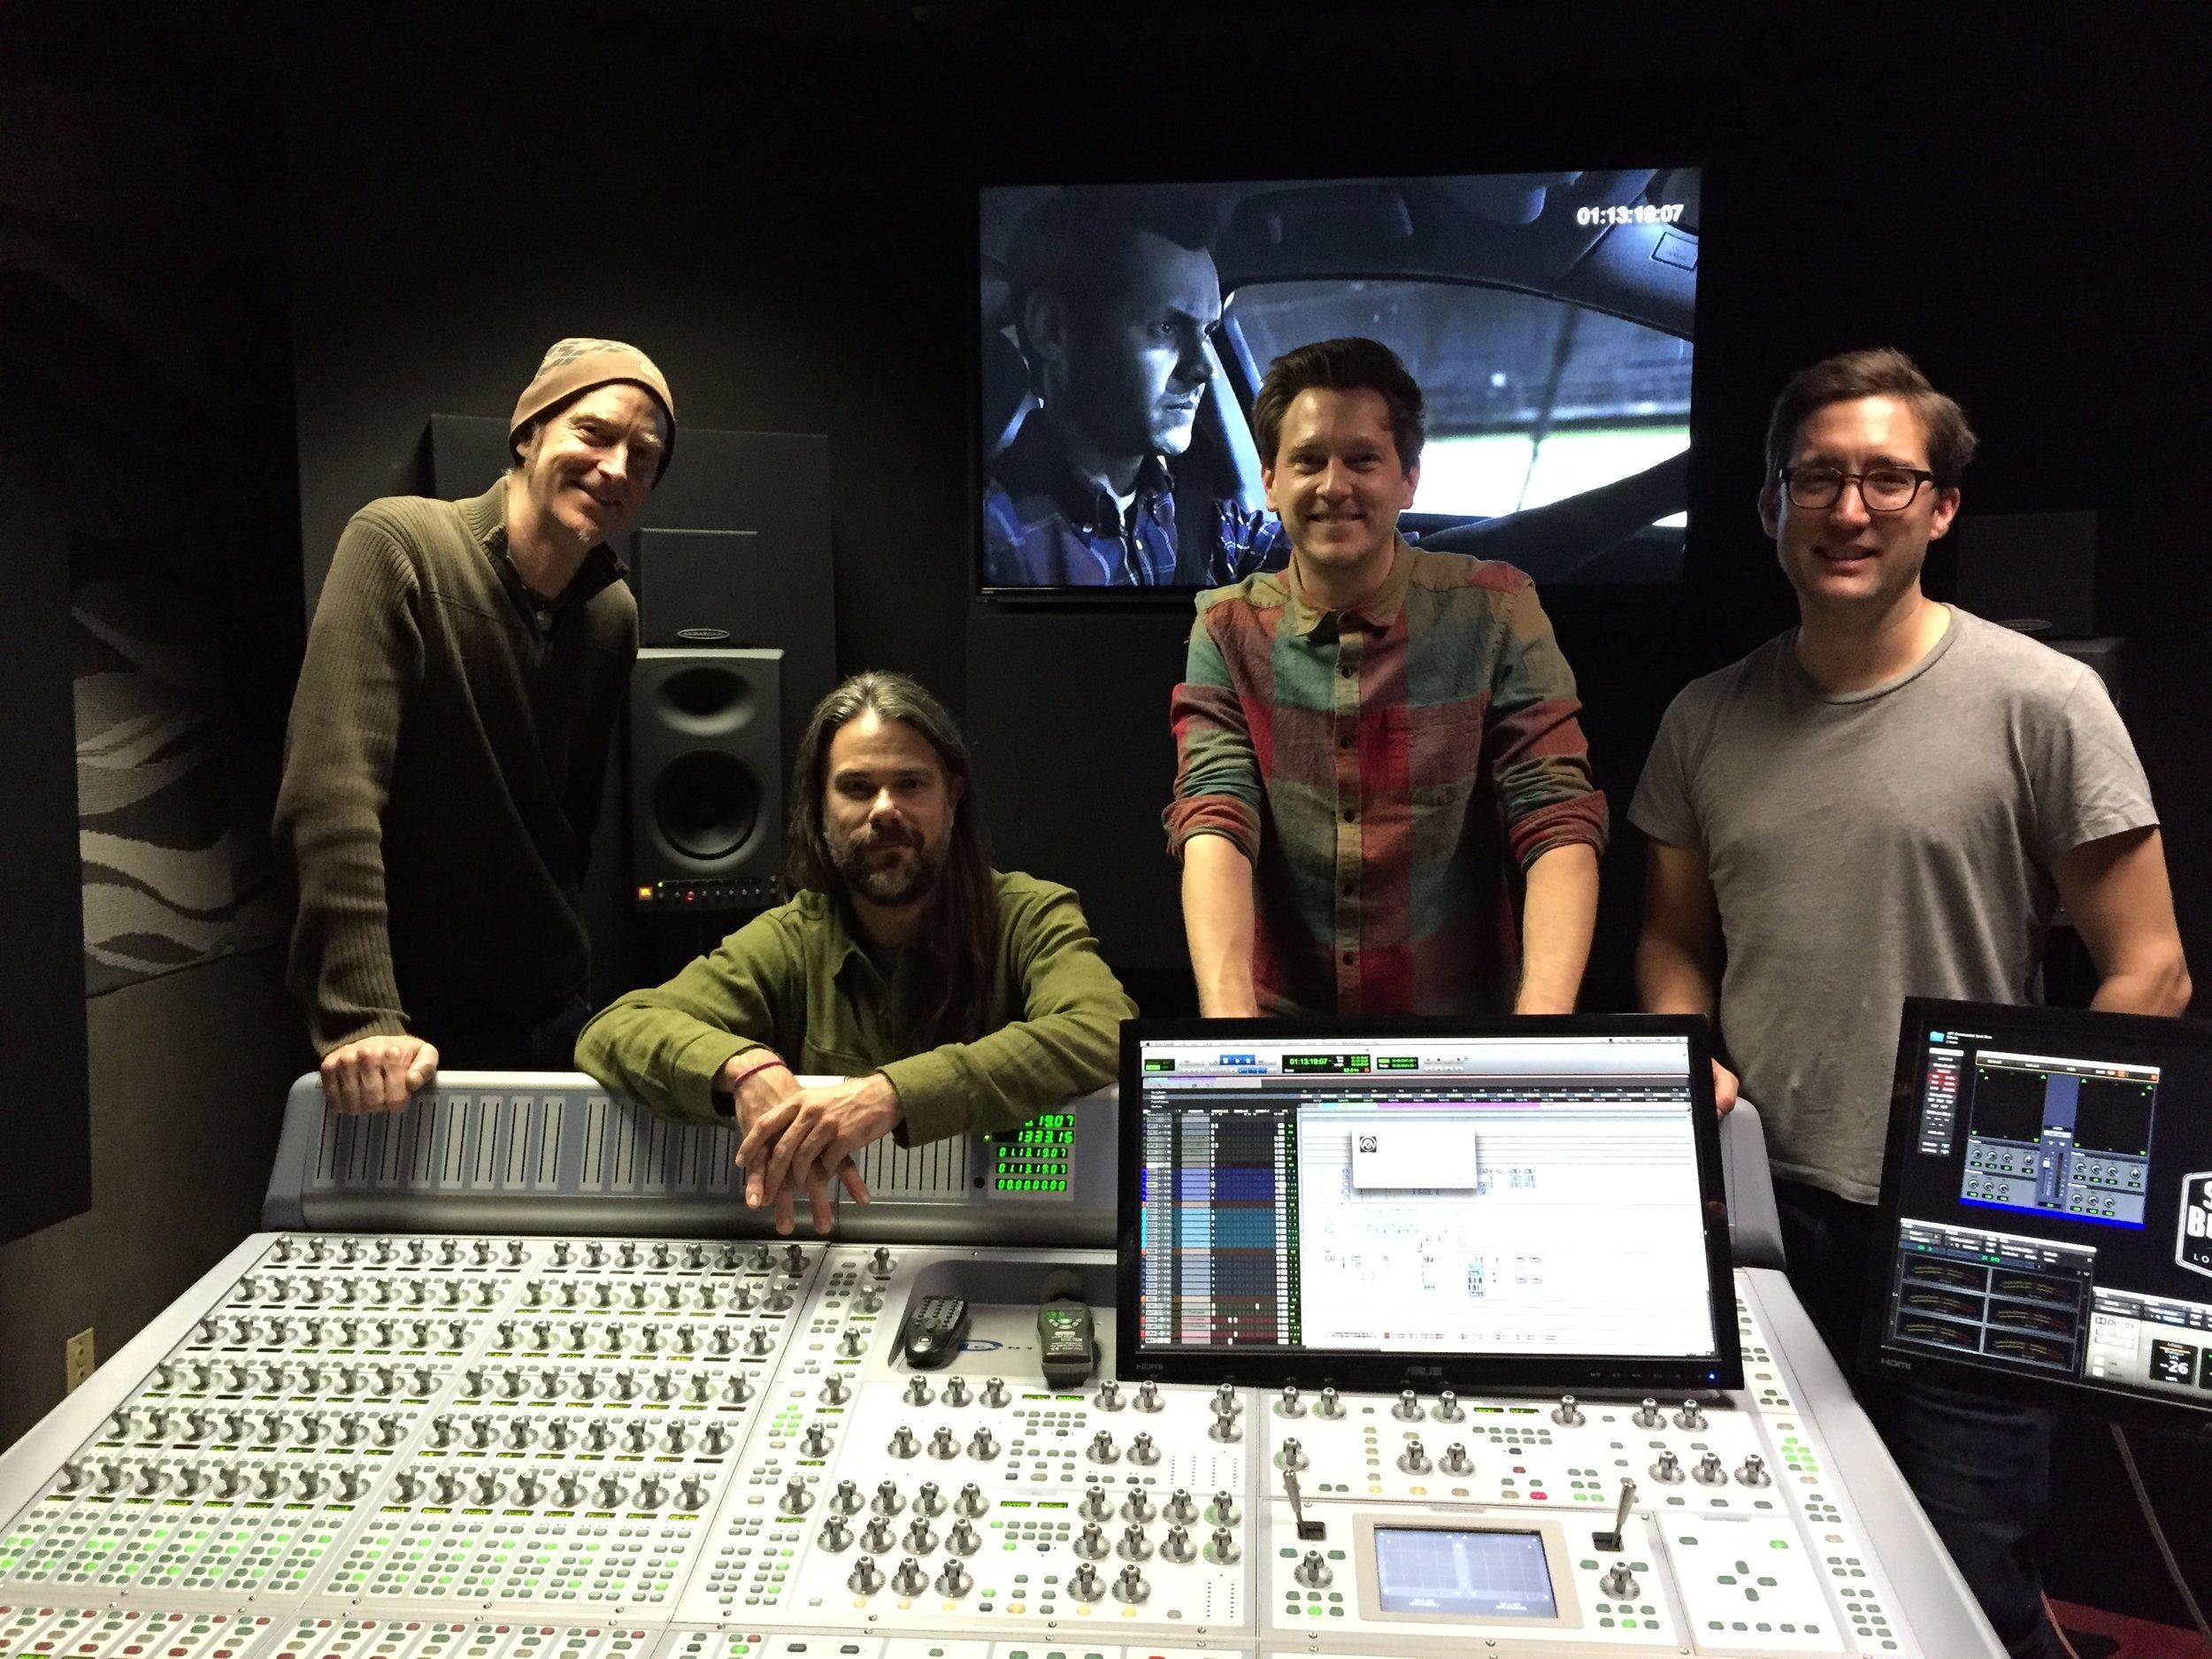 Composer Craig Richey, sound designers Ken Cain & Brett Bach, and Gareth at Sound Brigade for the final music mix.